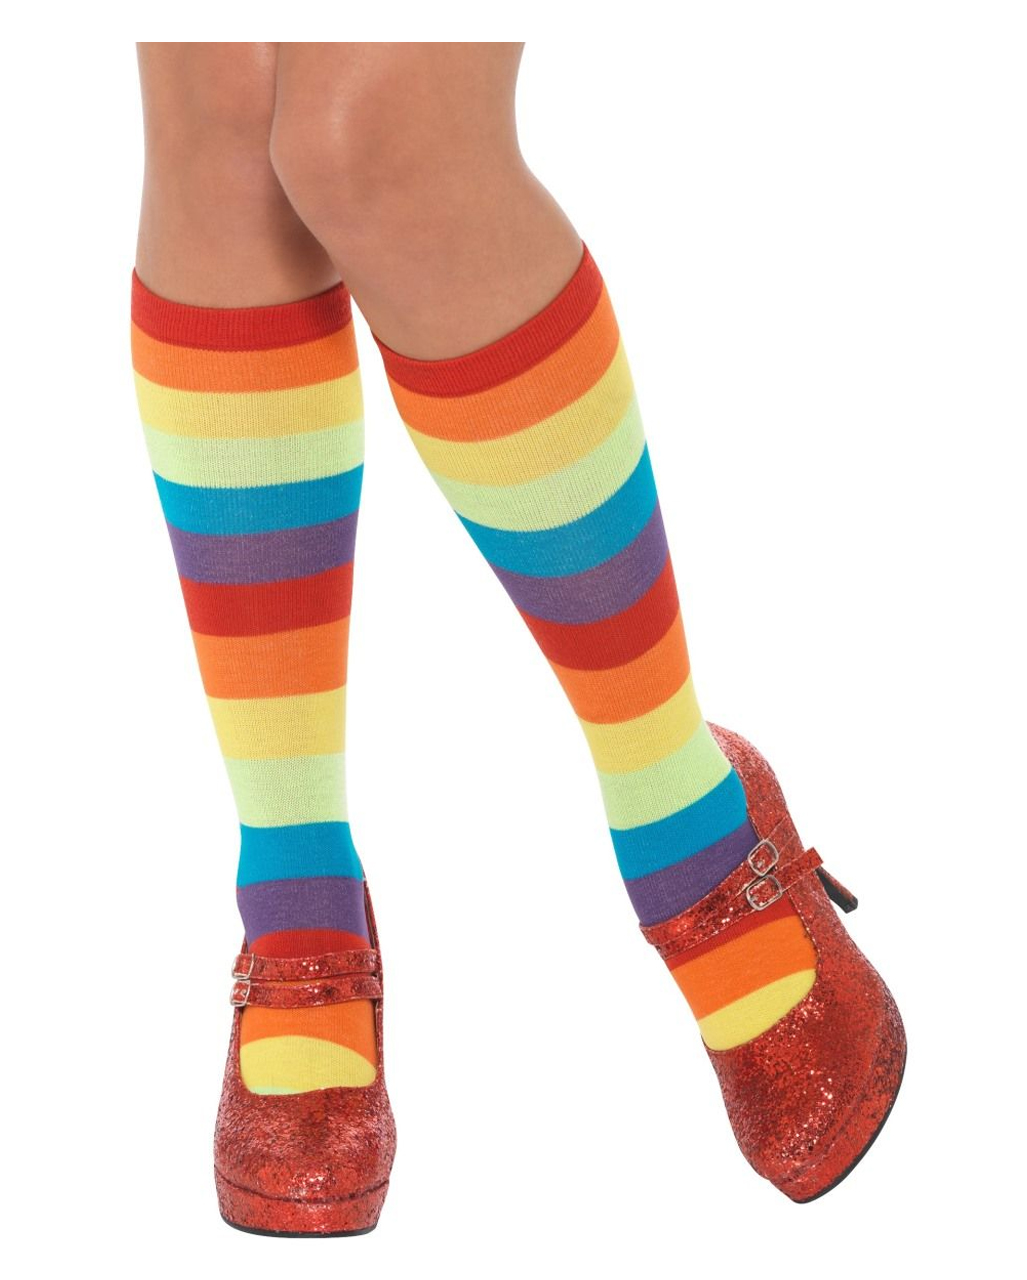 Long Adult Clown Jester Yellow Costume Socks With Rainbow Polka Dots